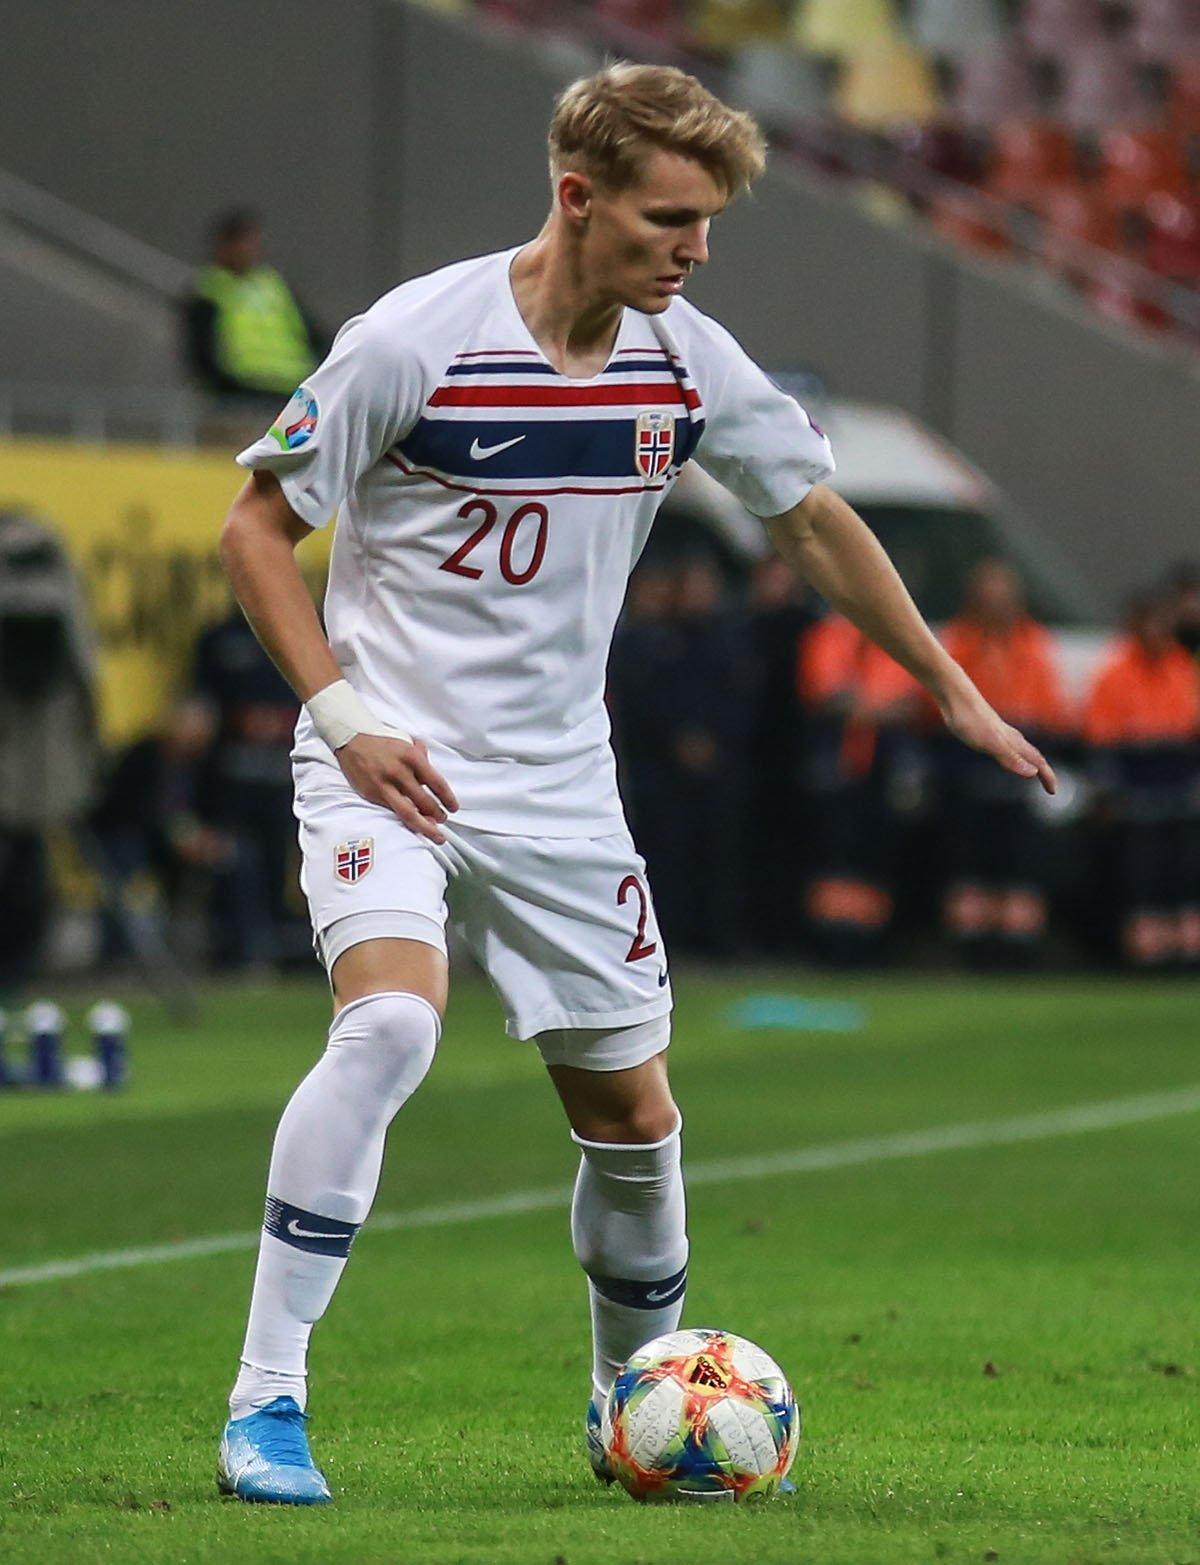 Martin Ødegaard playing for the Norwegian national team in 2019